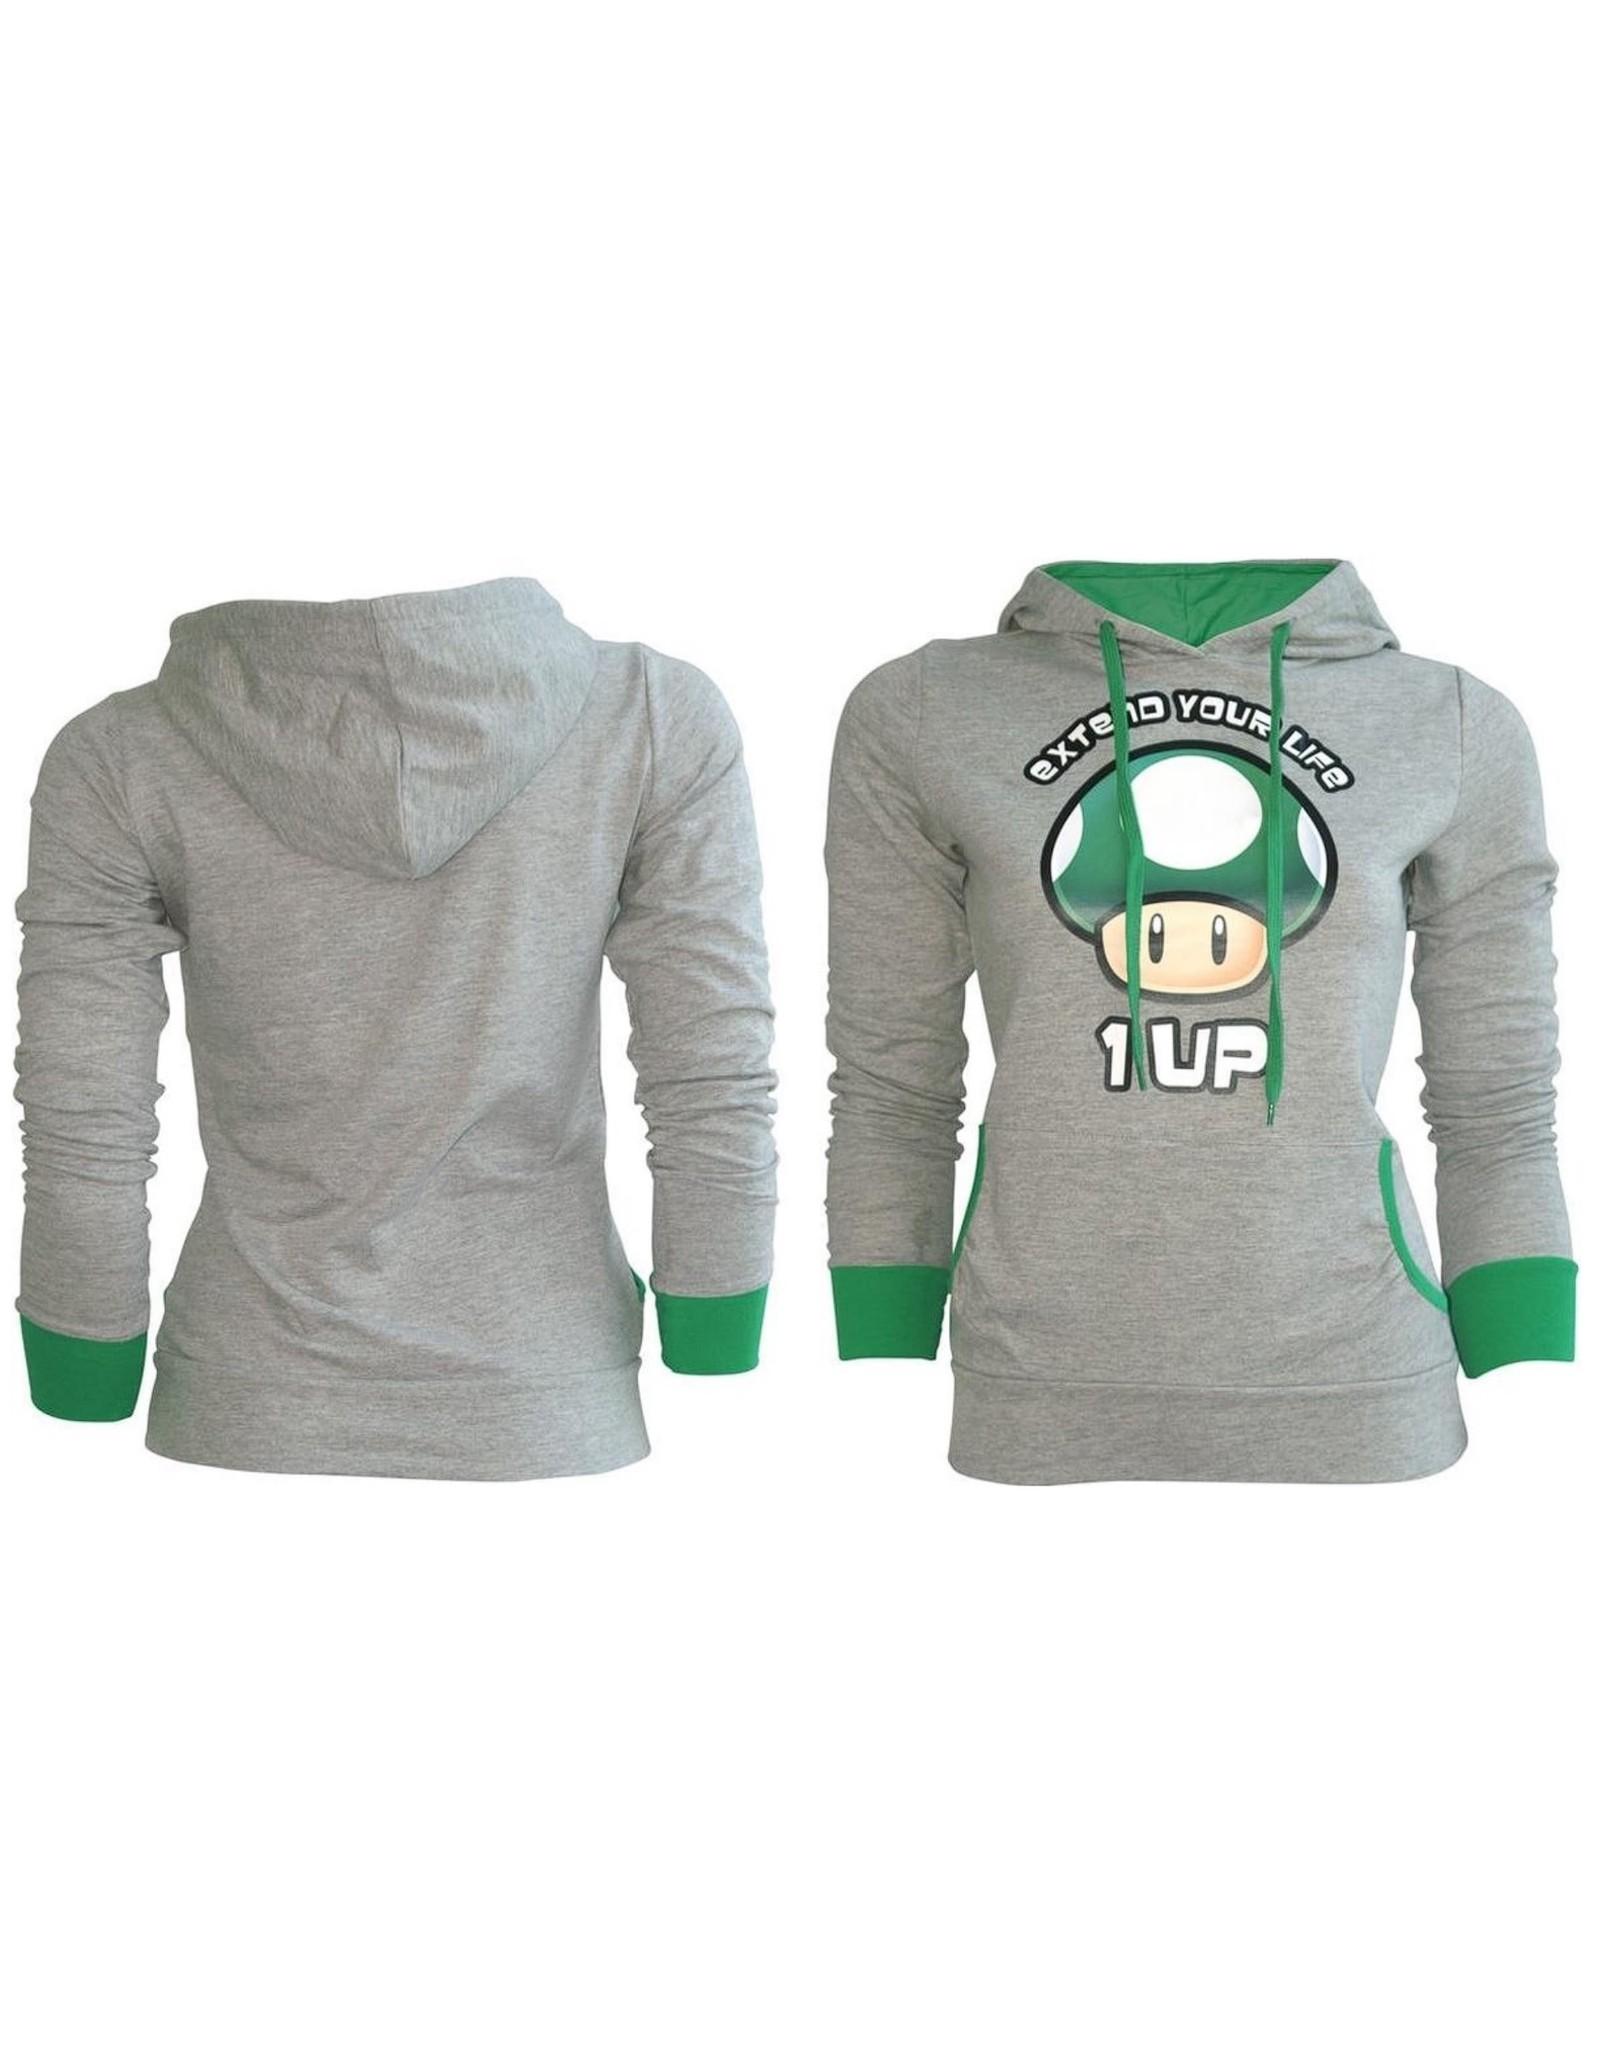 SUPER MARIO SweatShirt - Extend your Life Grey GIRLS (L)